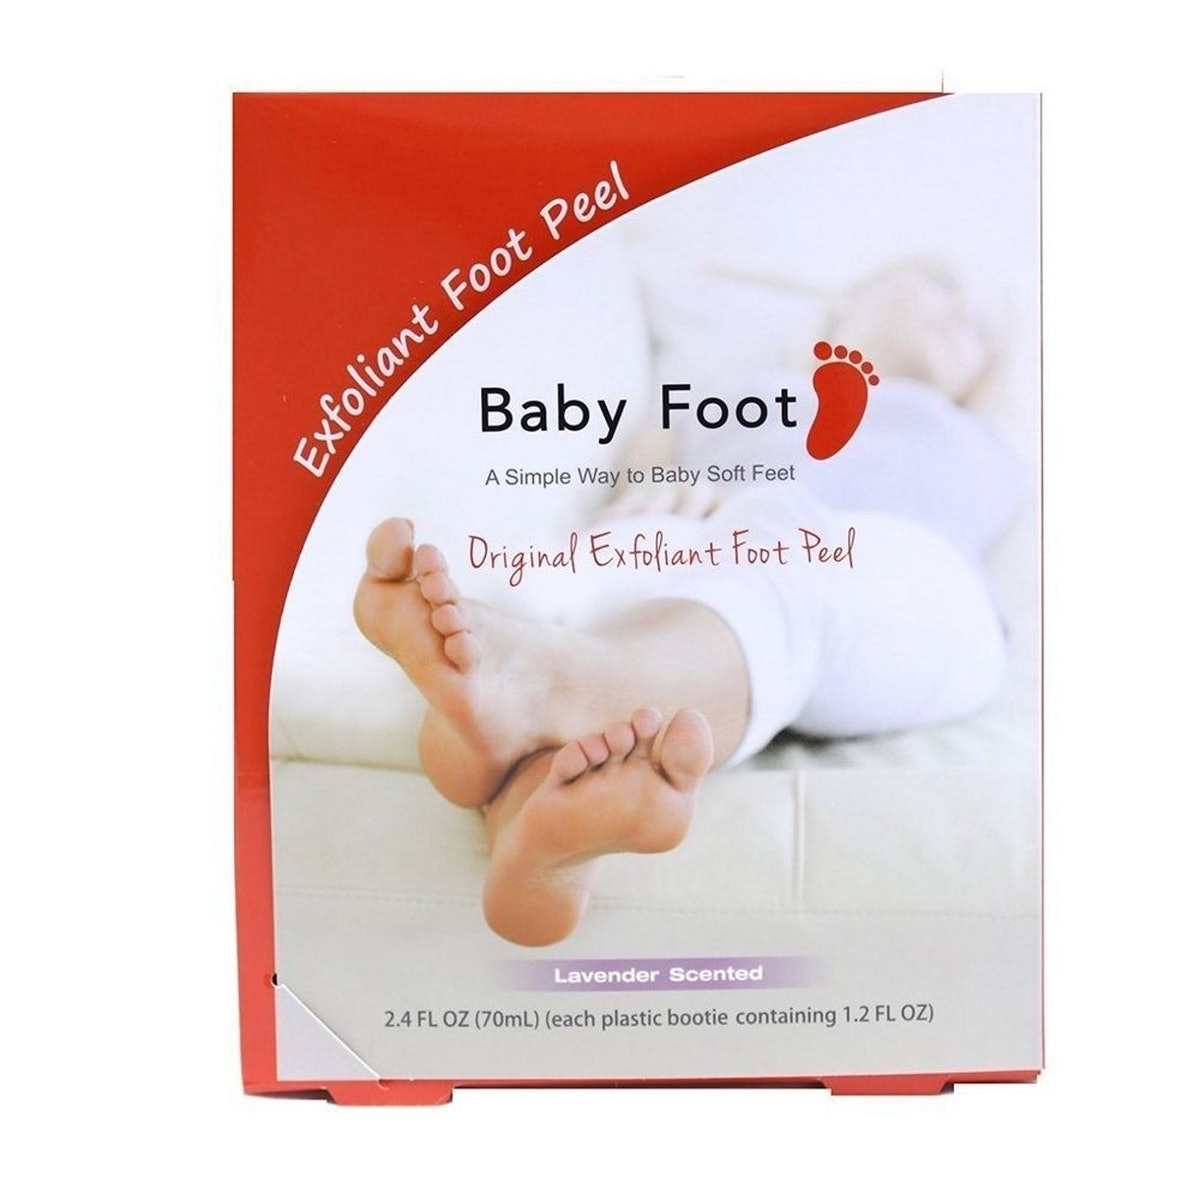 Baby Foot Exfoliant